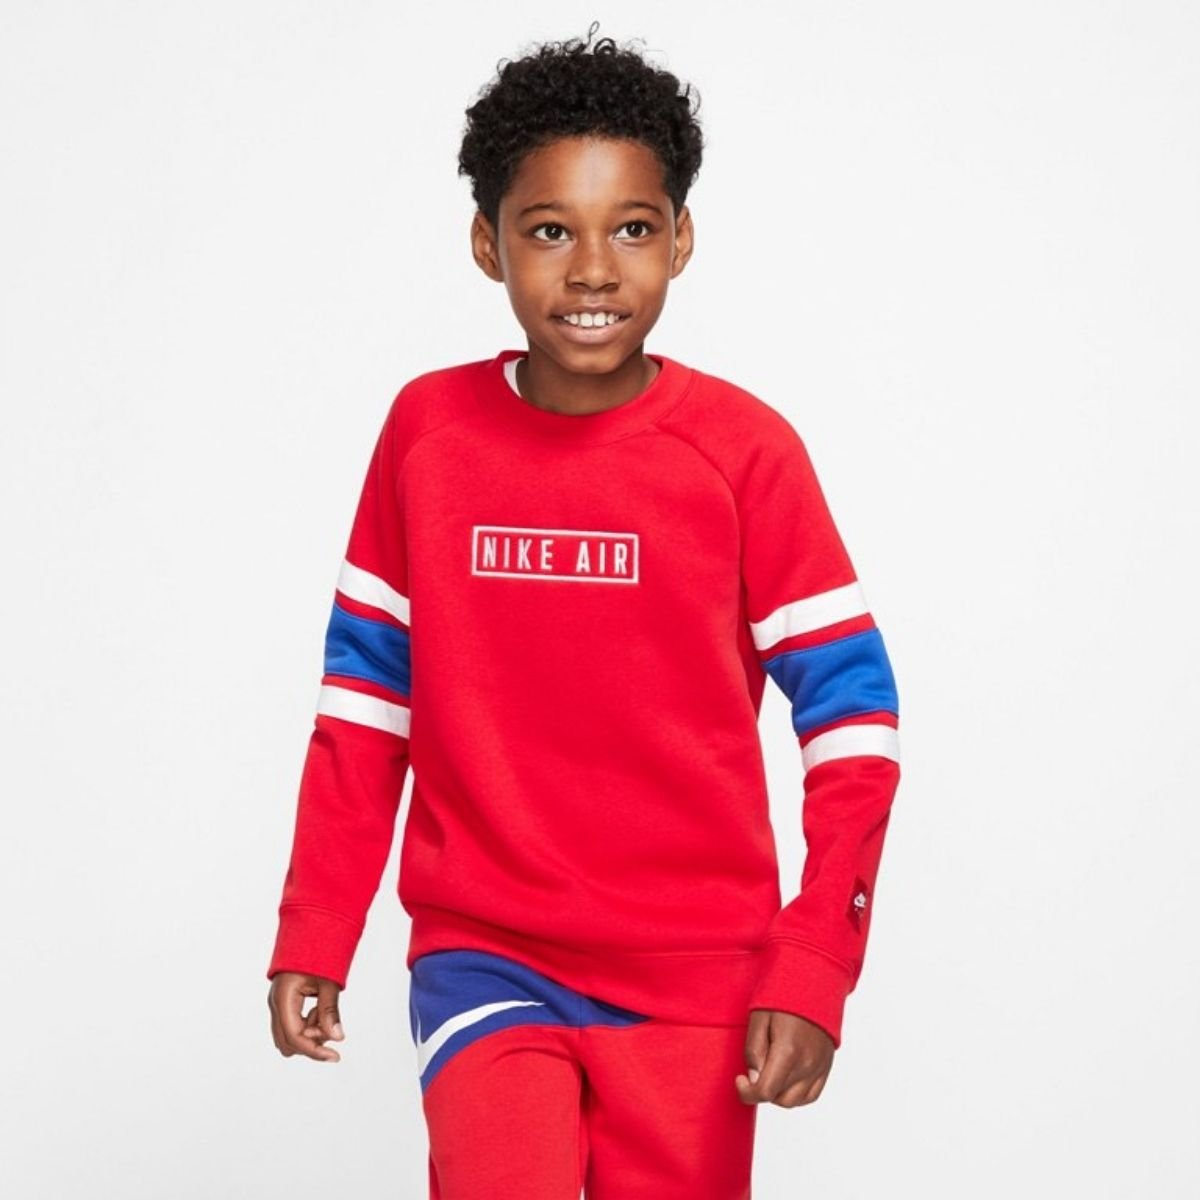 T-Shirt Nike Air In Cotone...